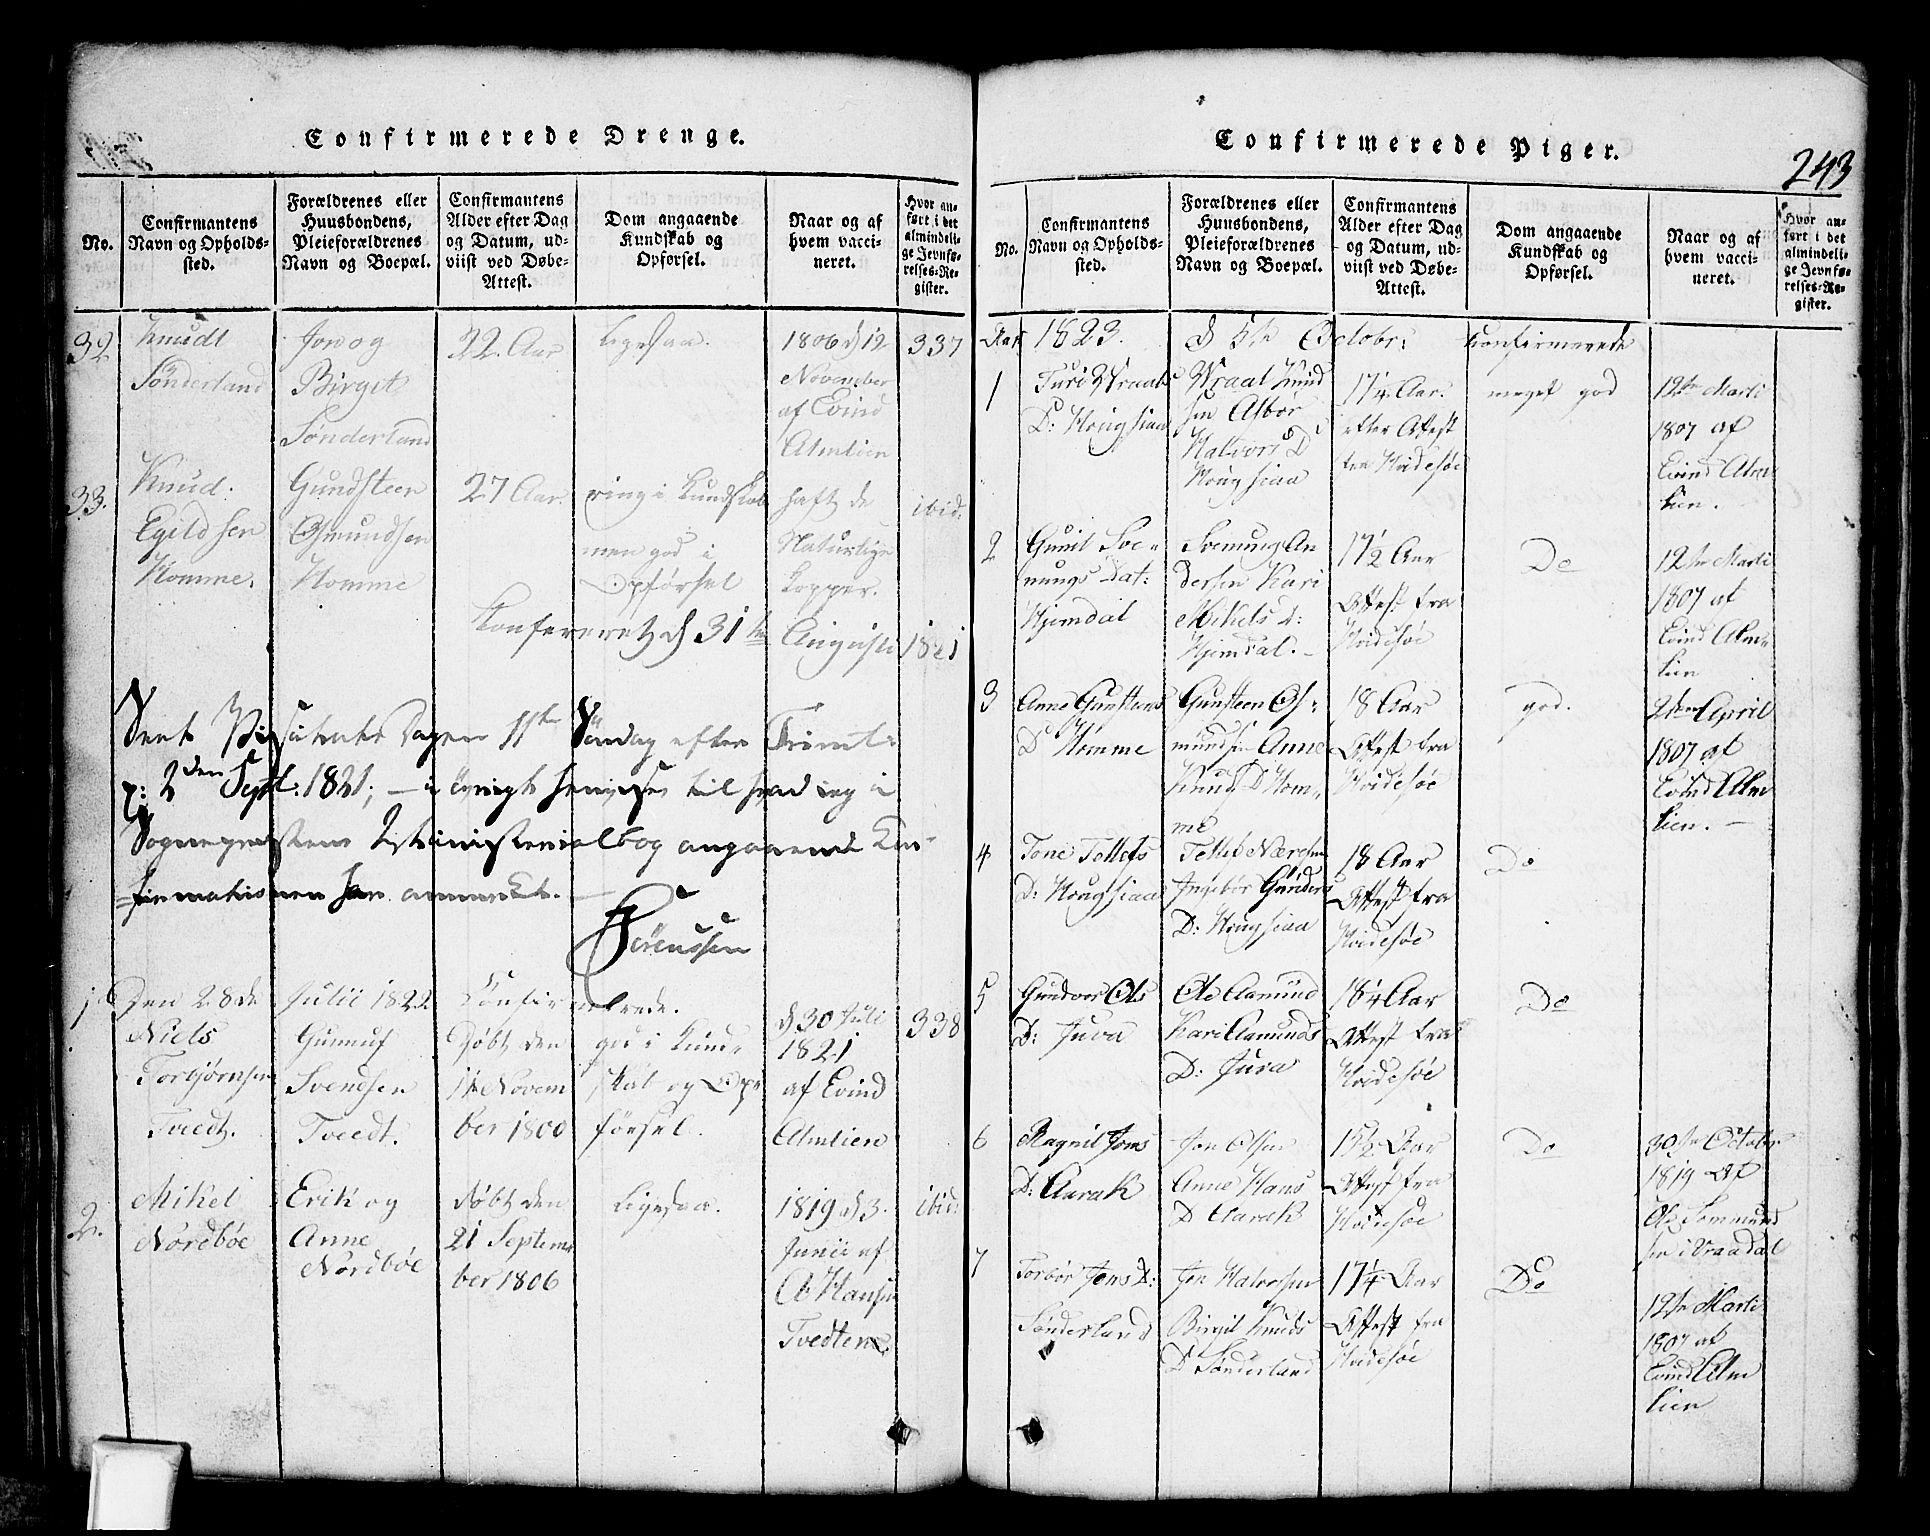 SAKO, Nissedal kirkebøker, G/Gb/L0001: Klokkerbok nr. II 1, 1814-1862, s. 243